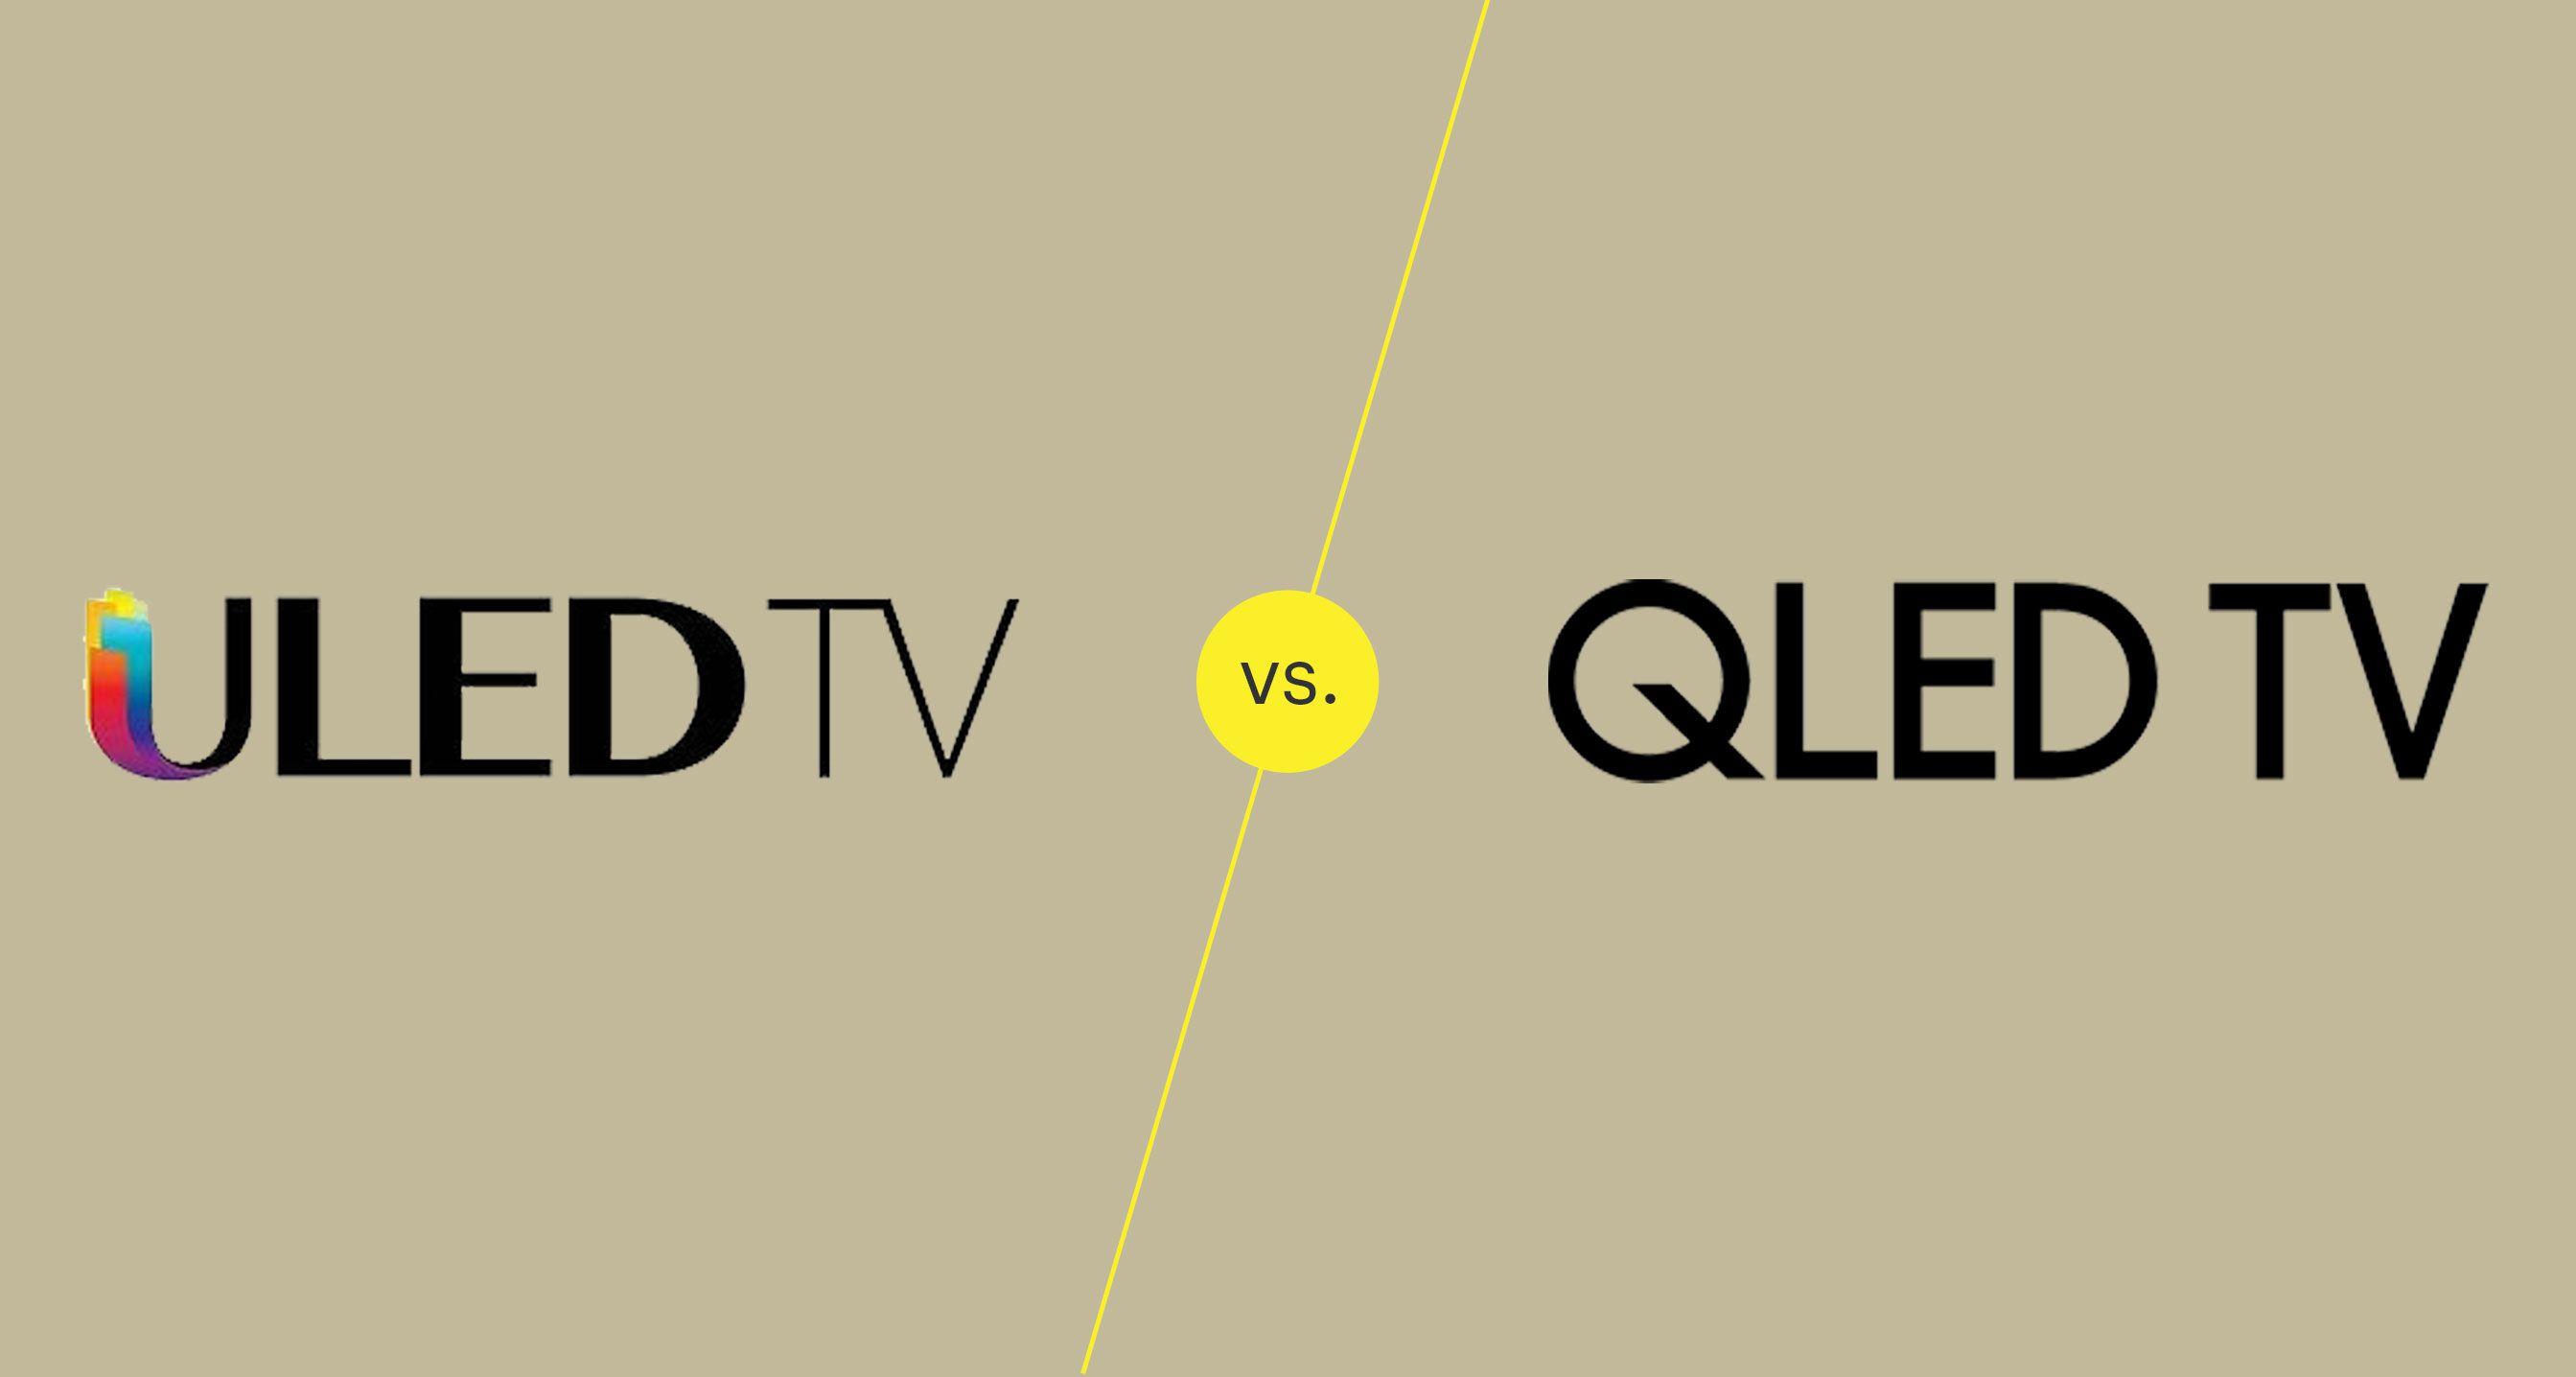 ULED vs QLED TVs